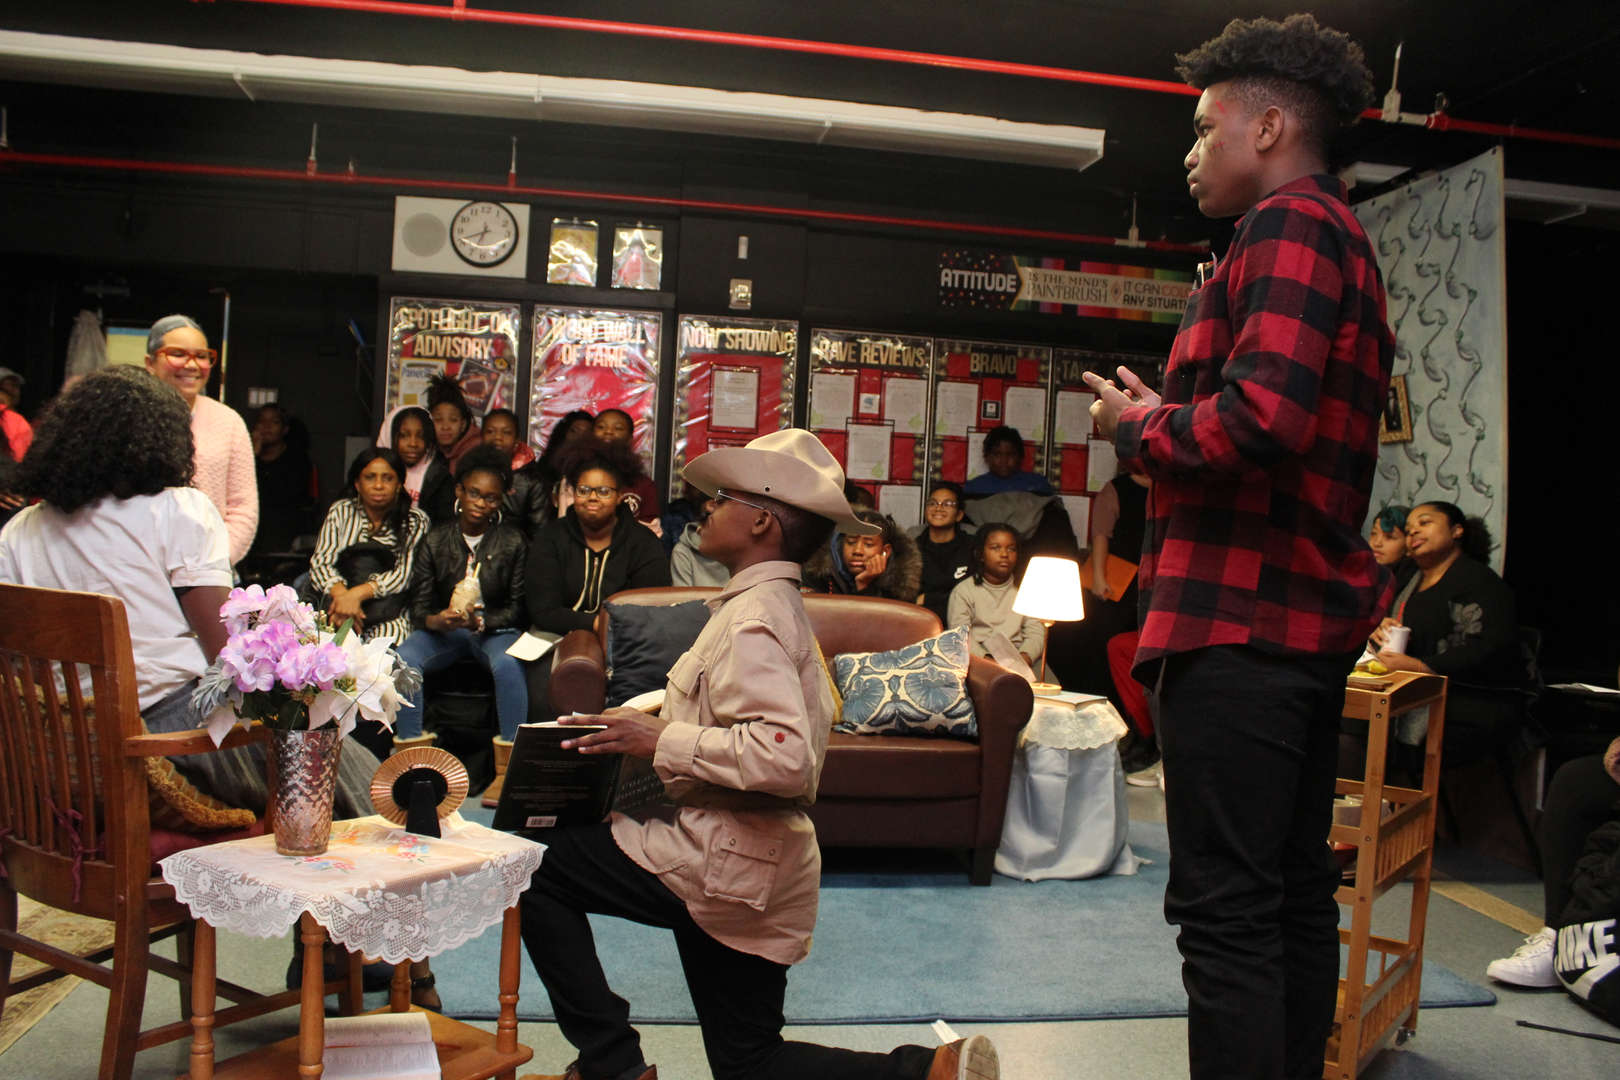 Three actors listen to as an actress dressed as an elderly woman speak